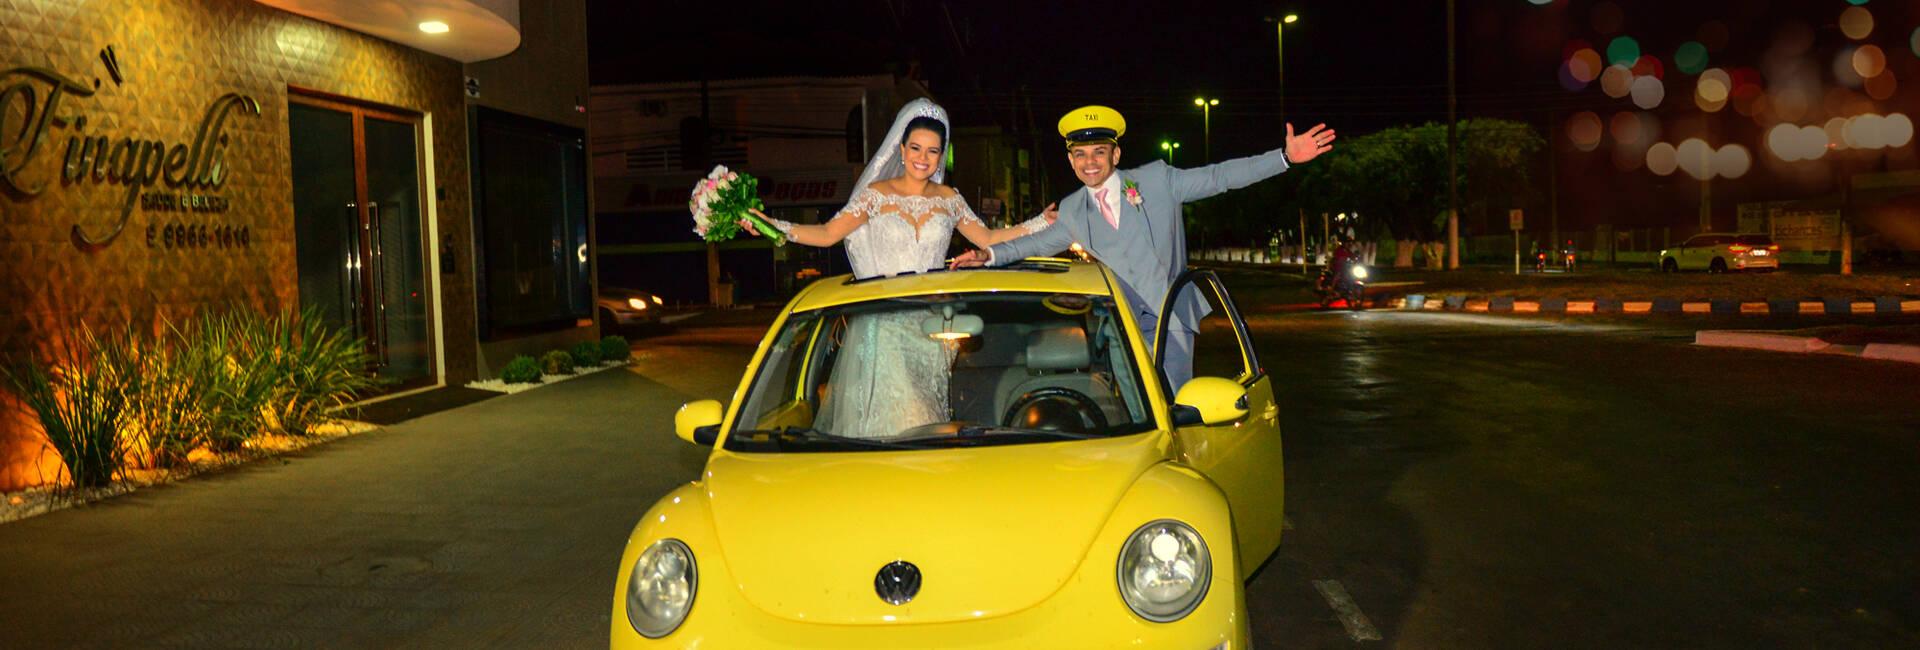 Casamento de Érica e Wander